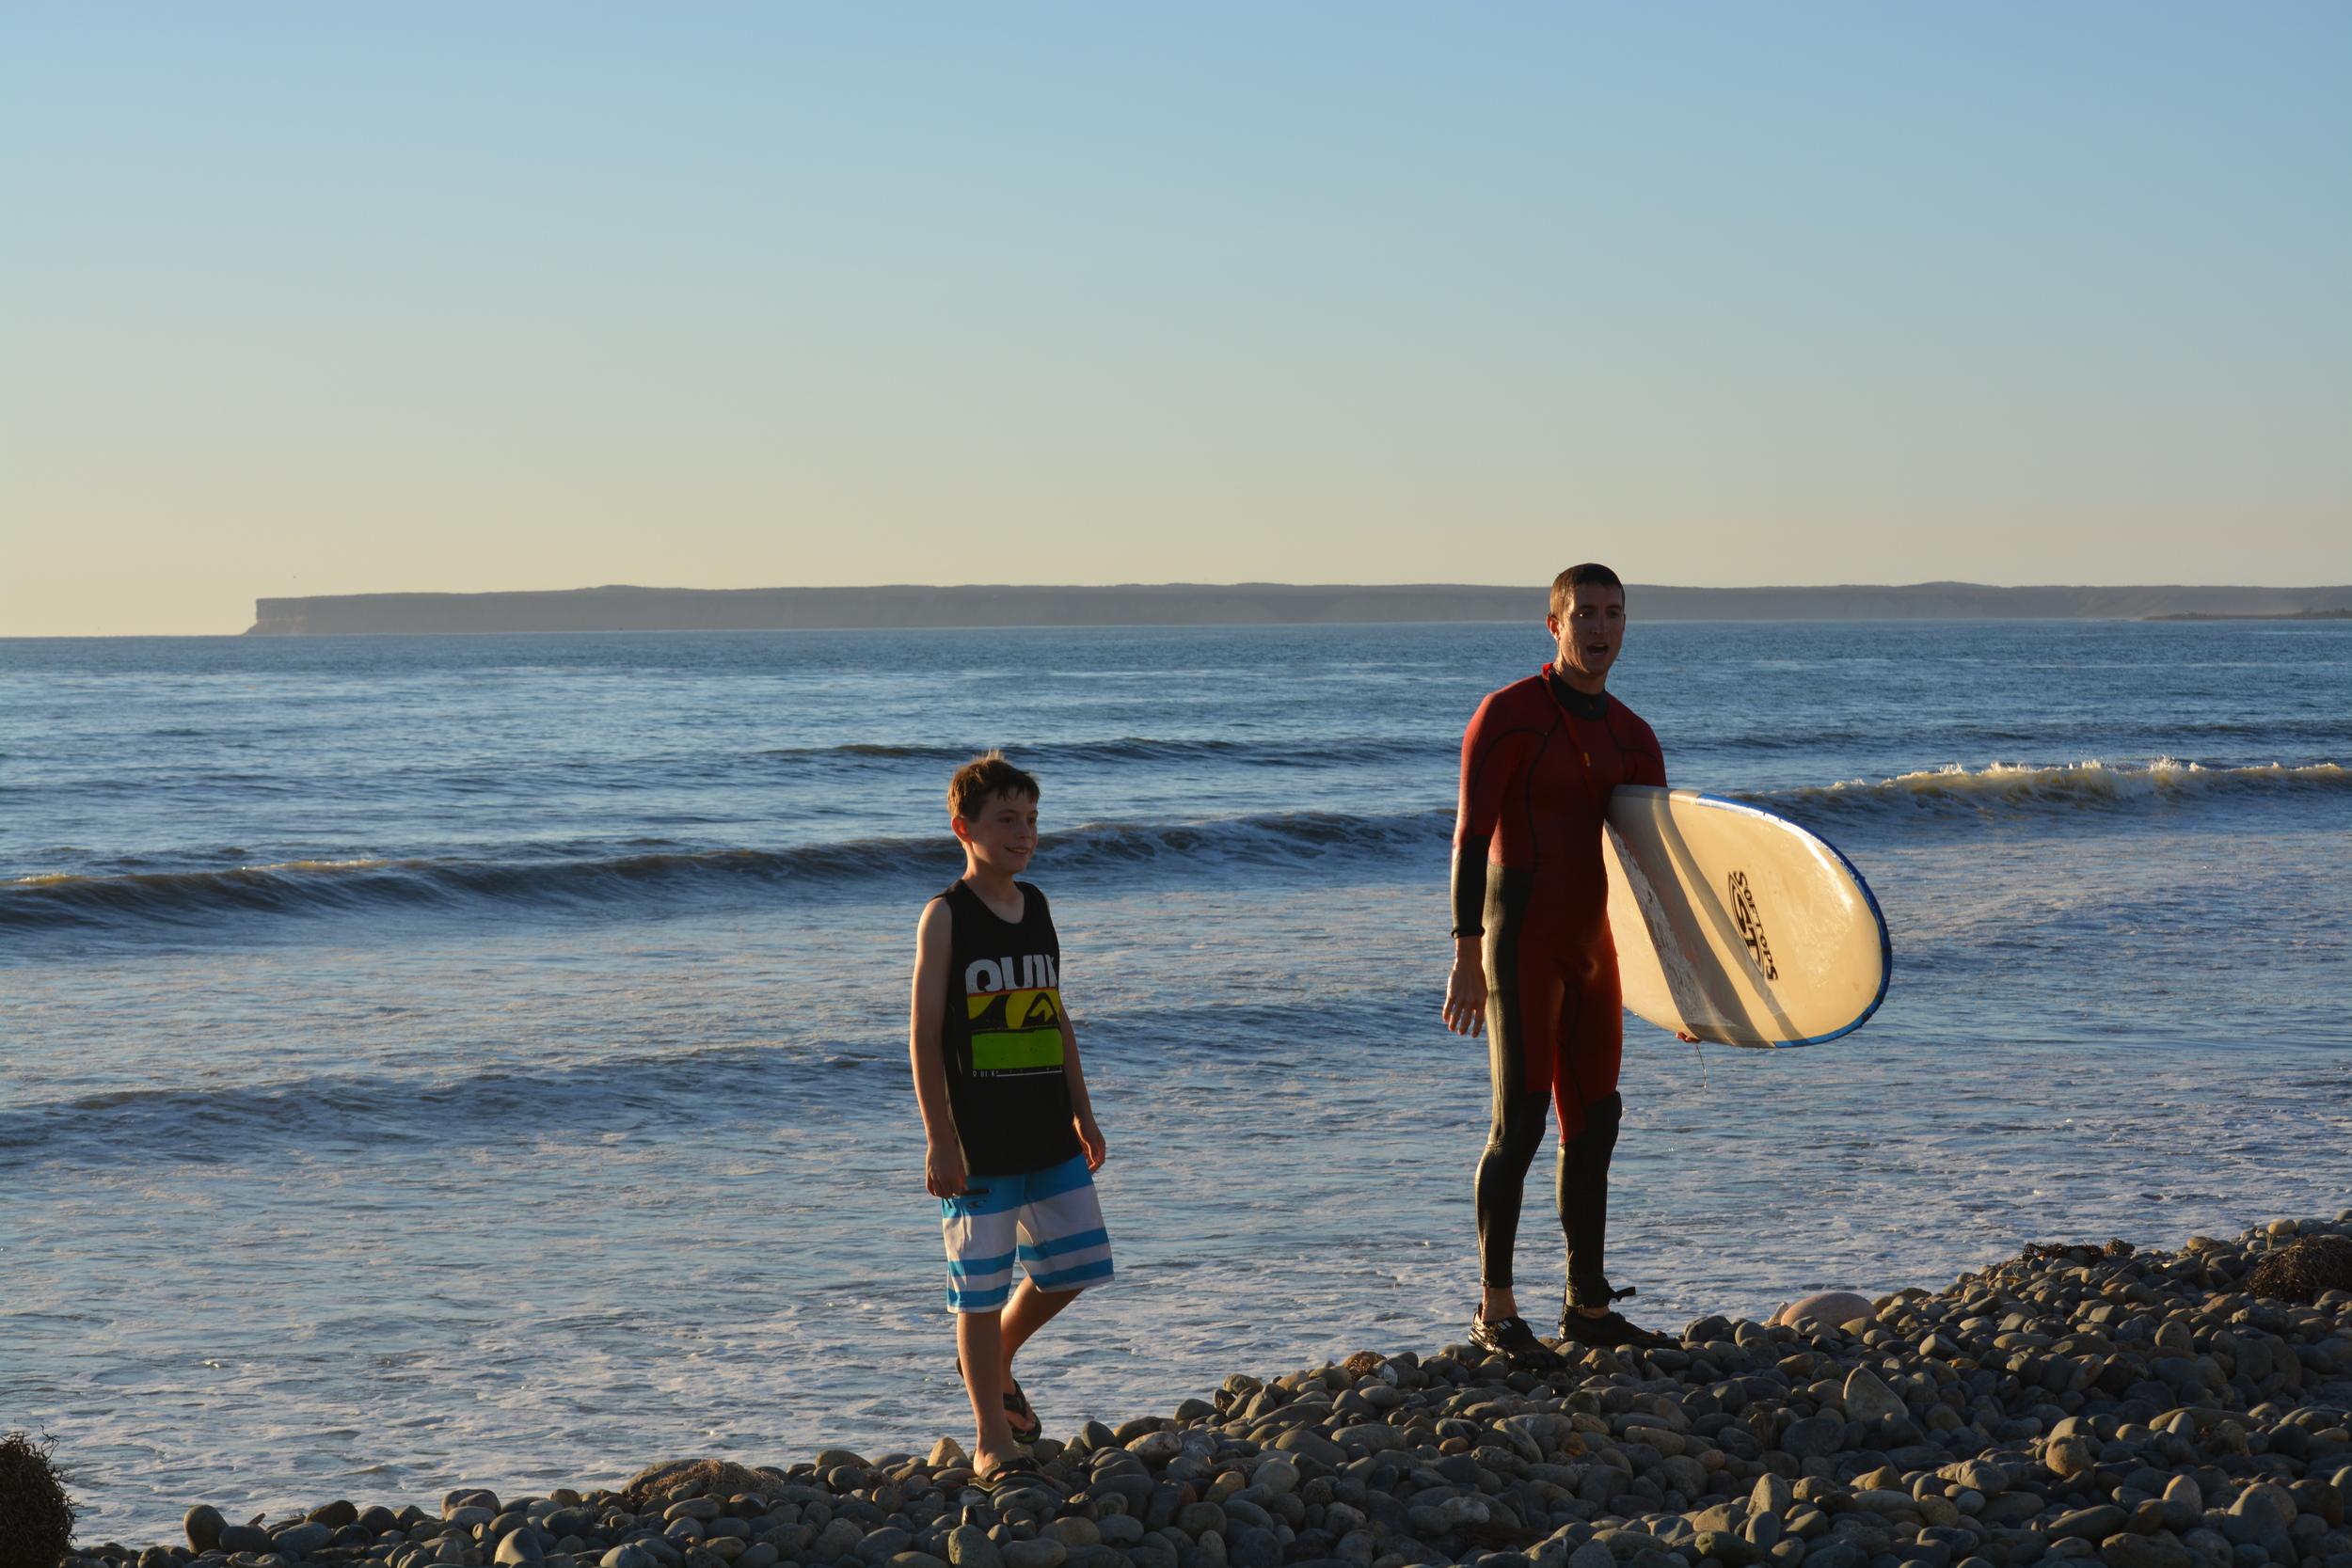 Baja California 10-5-13 Shipwrecks Surfing Adventure Ocean Experience Surf School San Diego (105).JPG